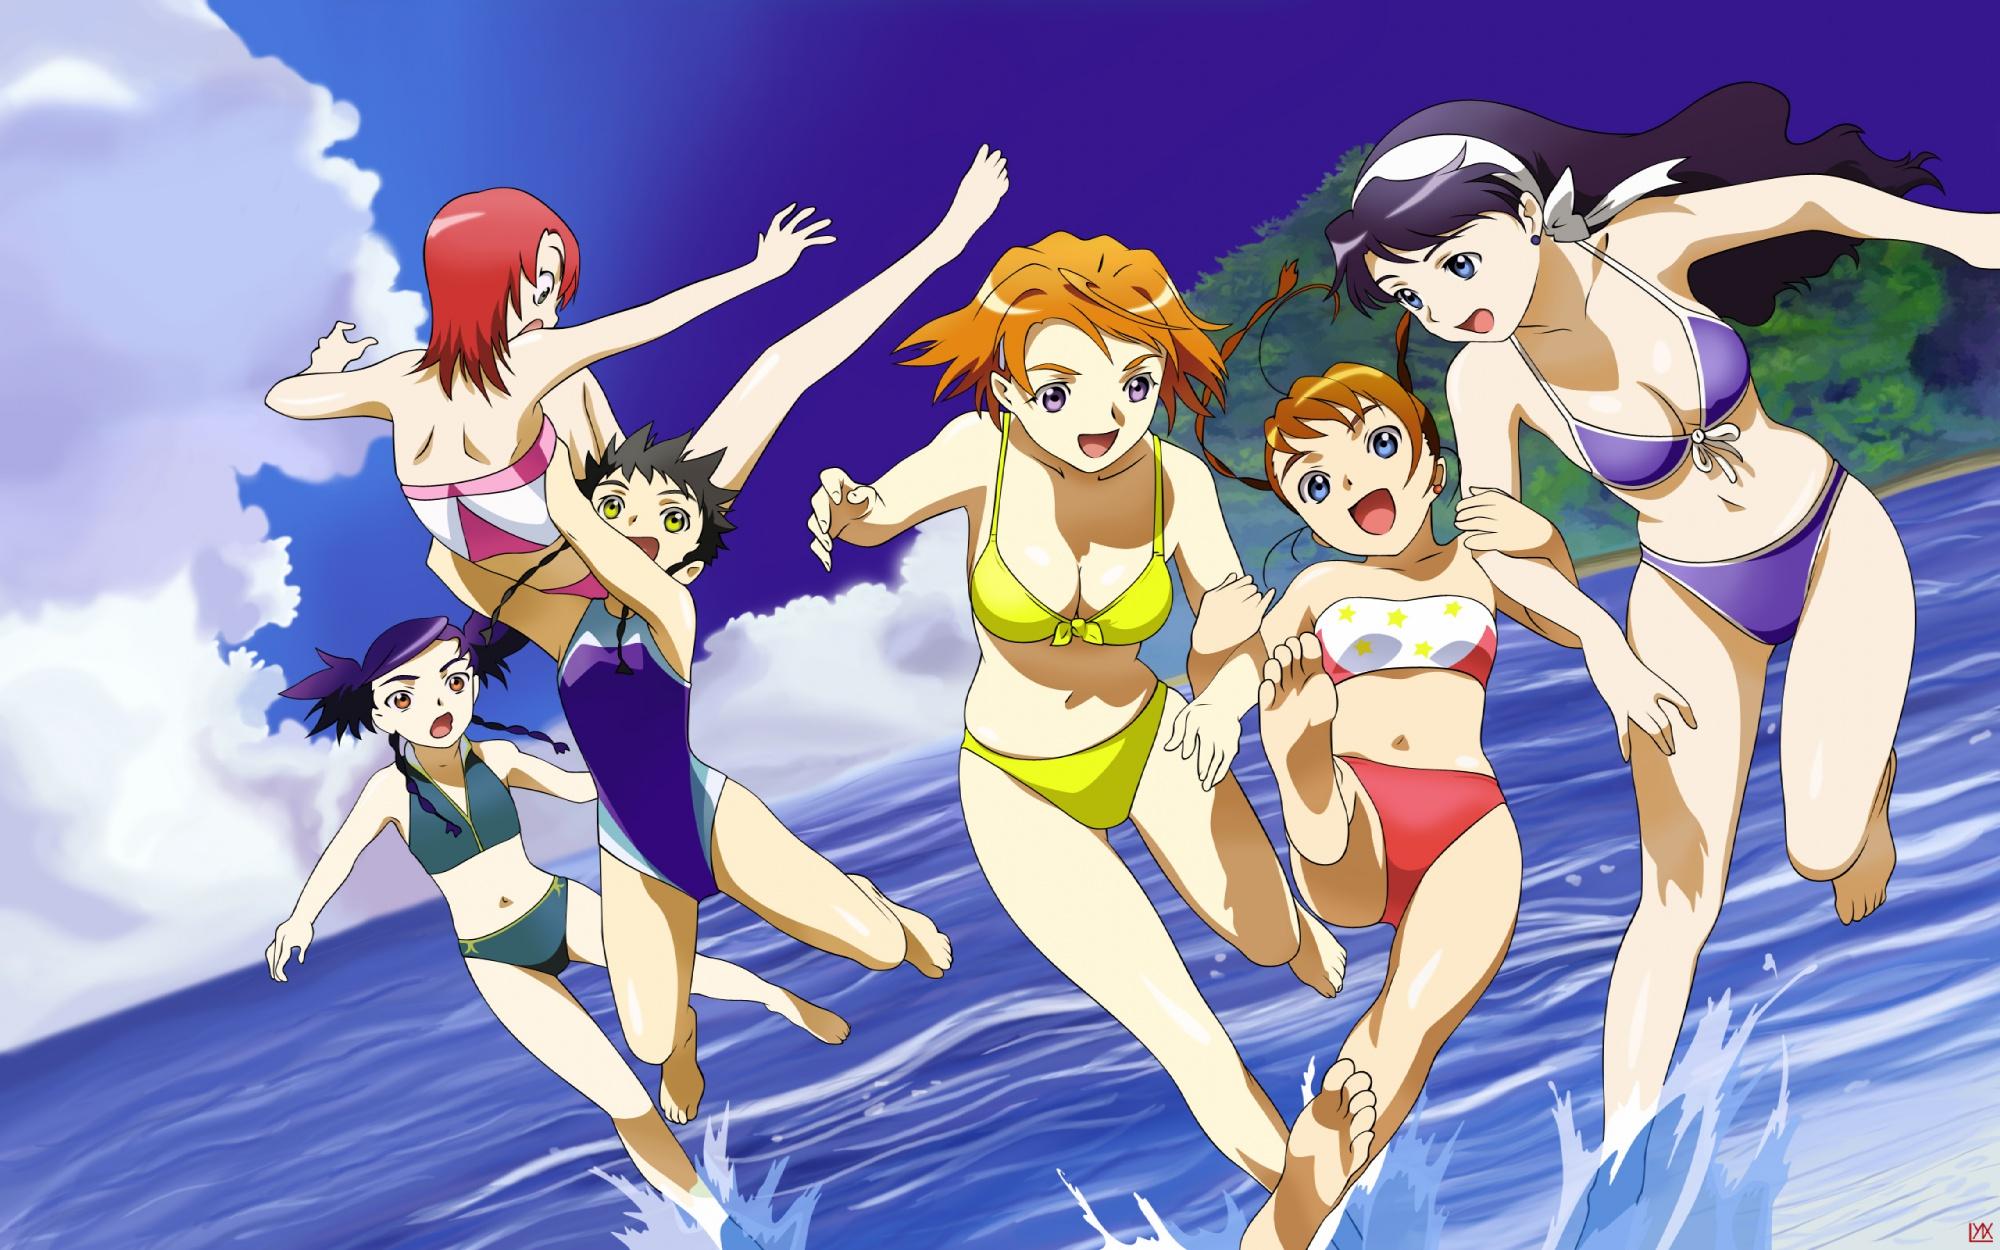 beach bikini black_hair blue_eyes brown_hair clouds headband mai-hime mai-otome minagi_mikoto nina_wang orange_hair purple_hair red_hair rena_sayers sky summer swimsuit tokiha_mai water yumemiya_arika yuuki_nao